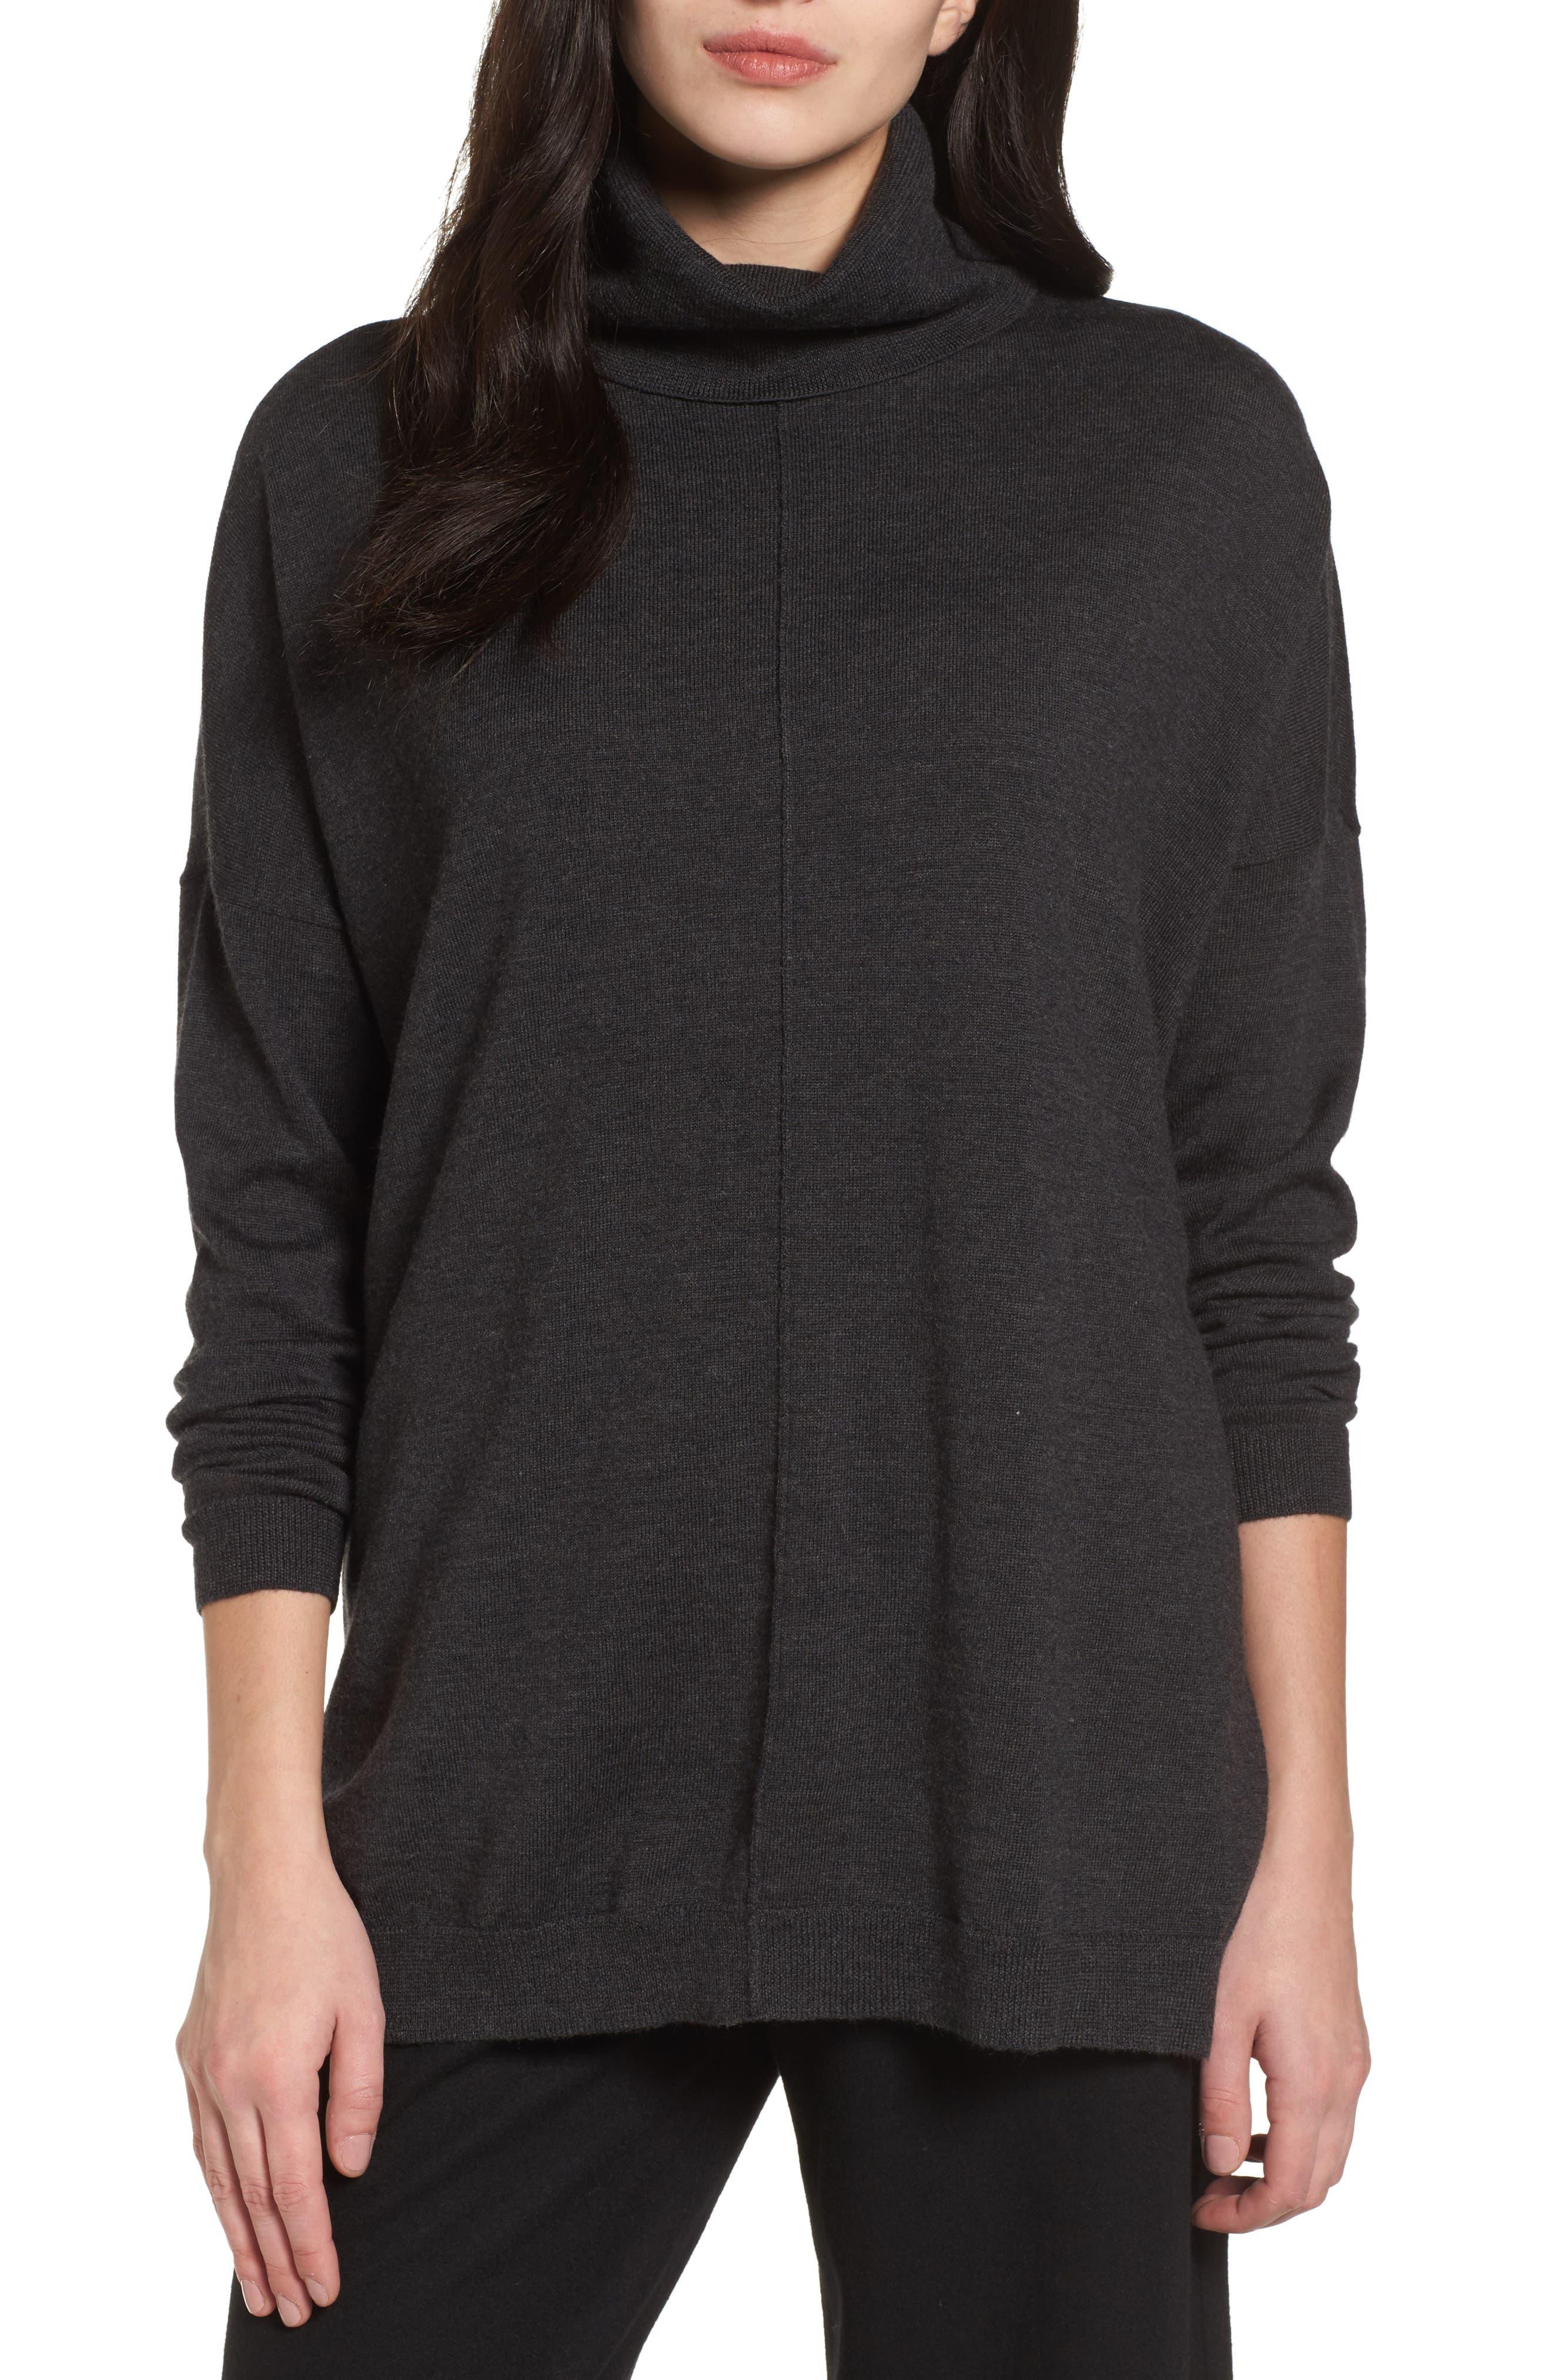 Merino Wool Boxy Turtleneck Sweater,                         Main,                         color, 021